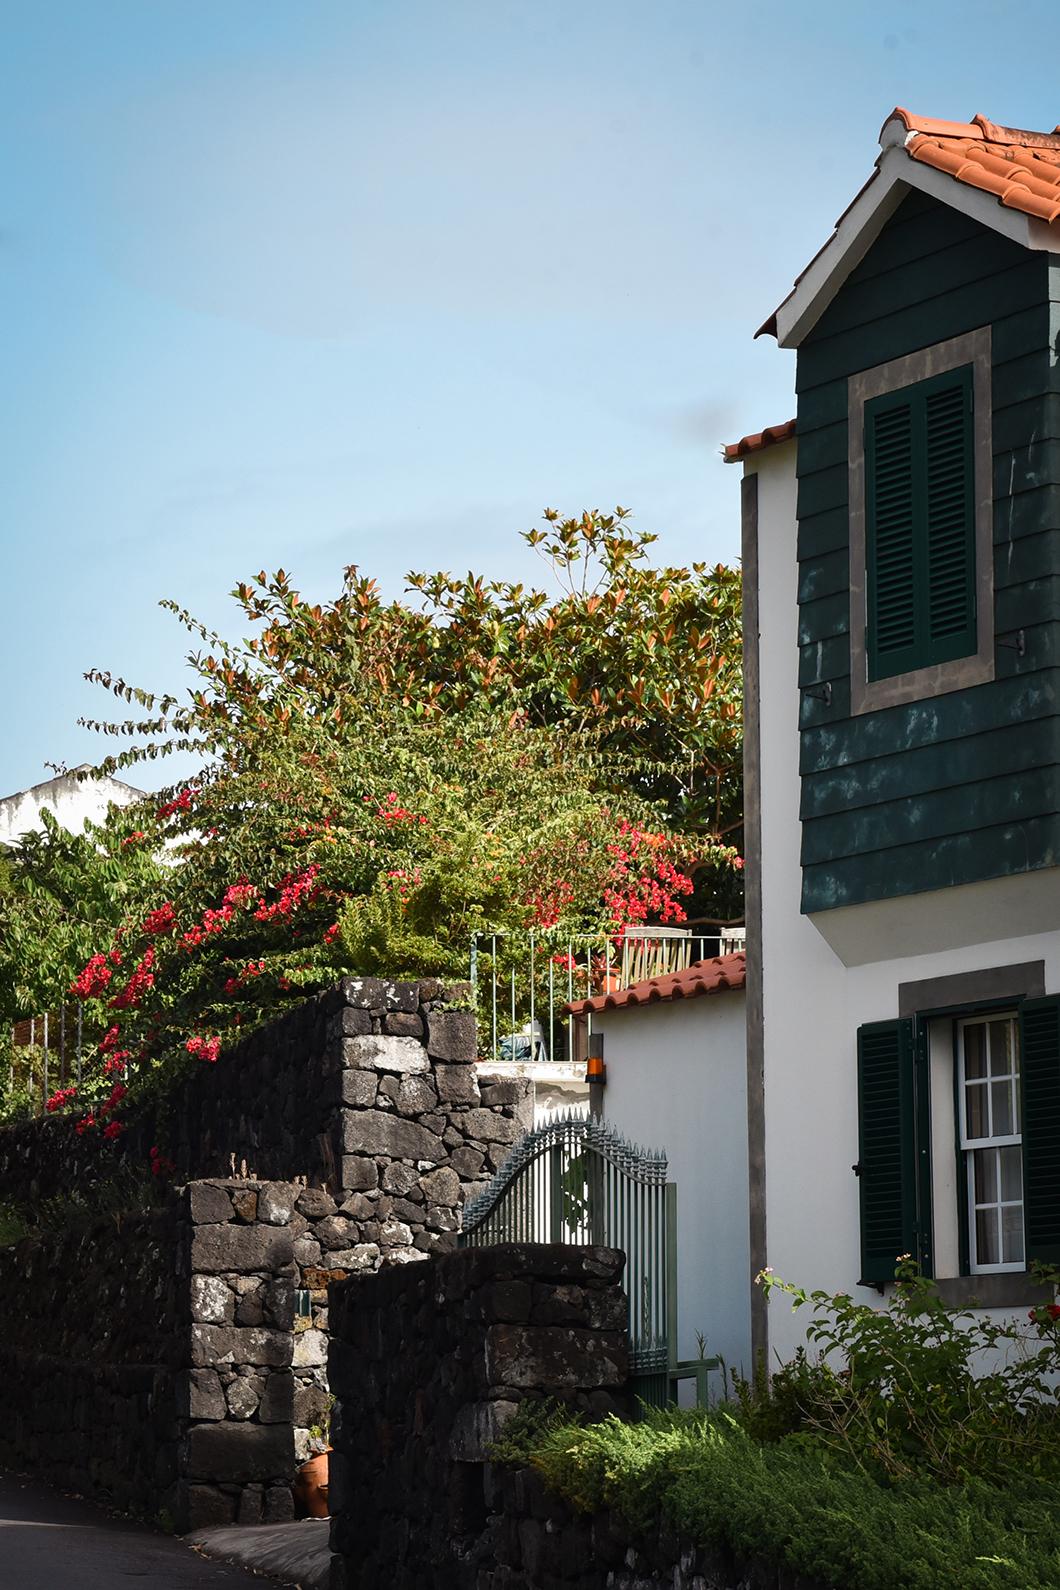 Sao Roque, incontournable dans les Açores